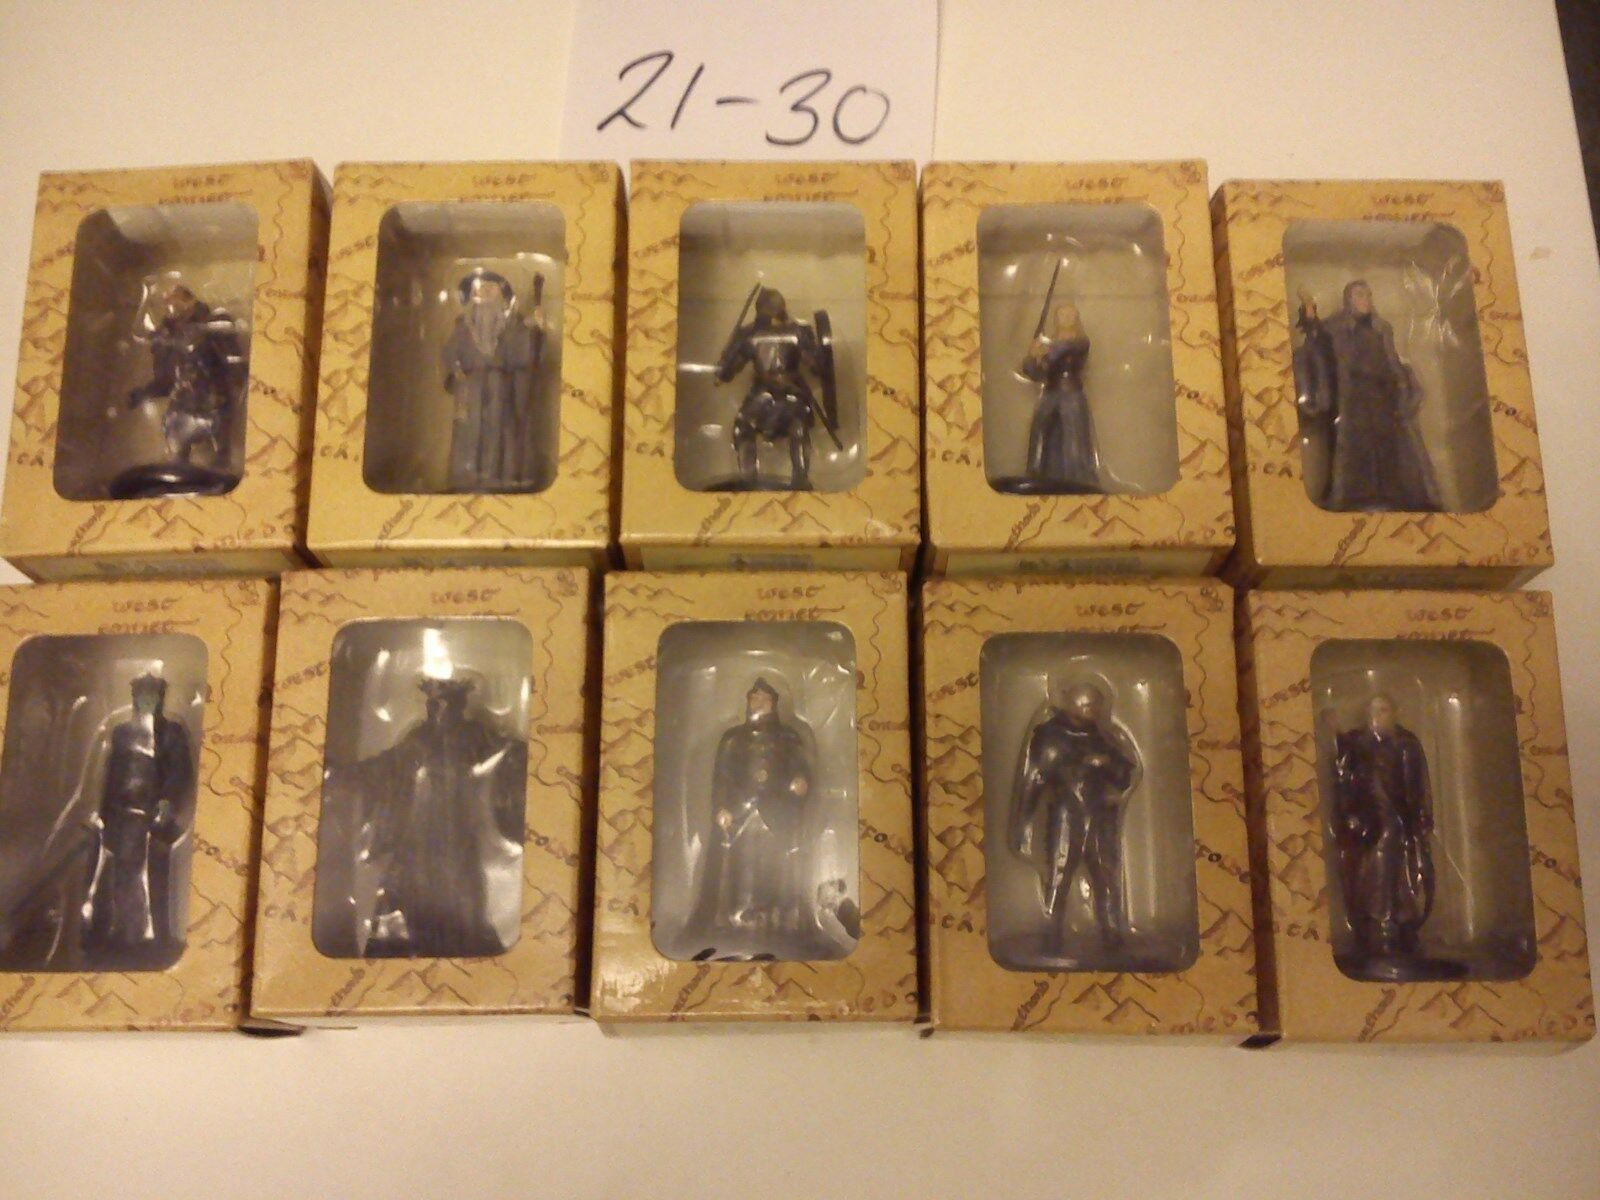 Lord of the RingsModels Figures Figures Figures Figurines 21-40 (20) Eaglemoss Publication fe24d5